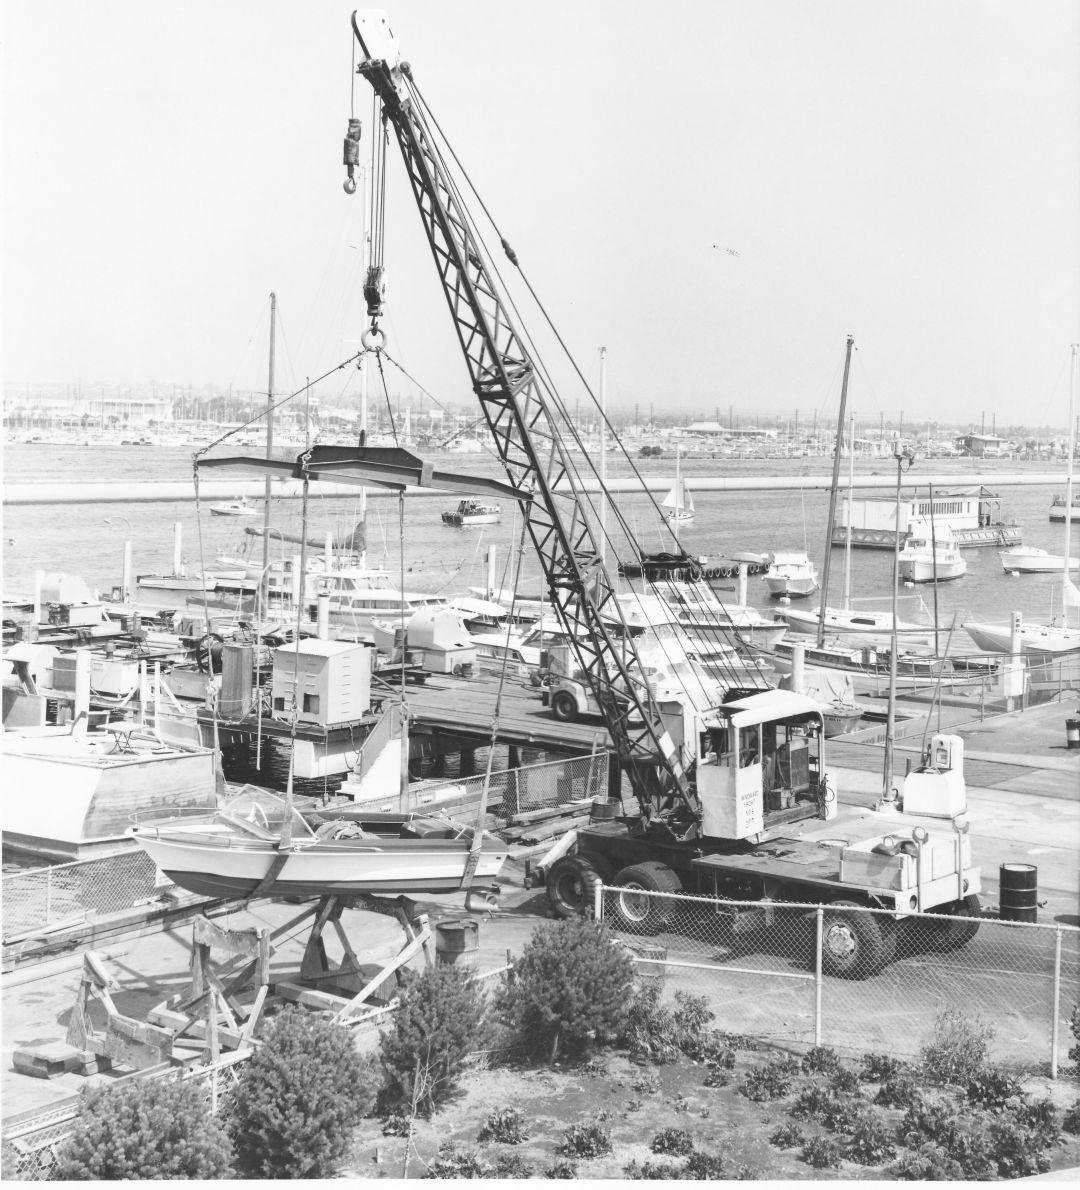 Motorboat on a Crane